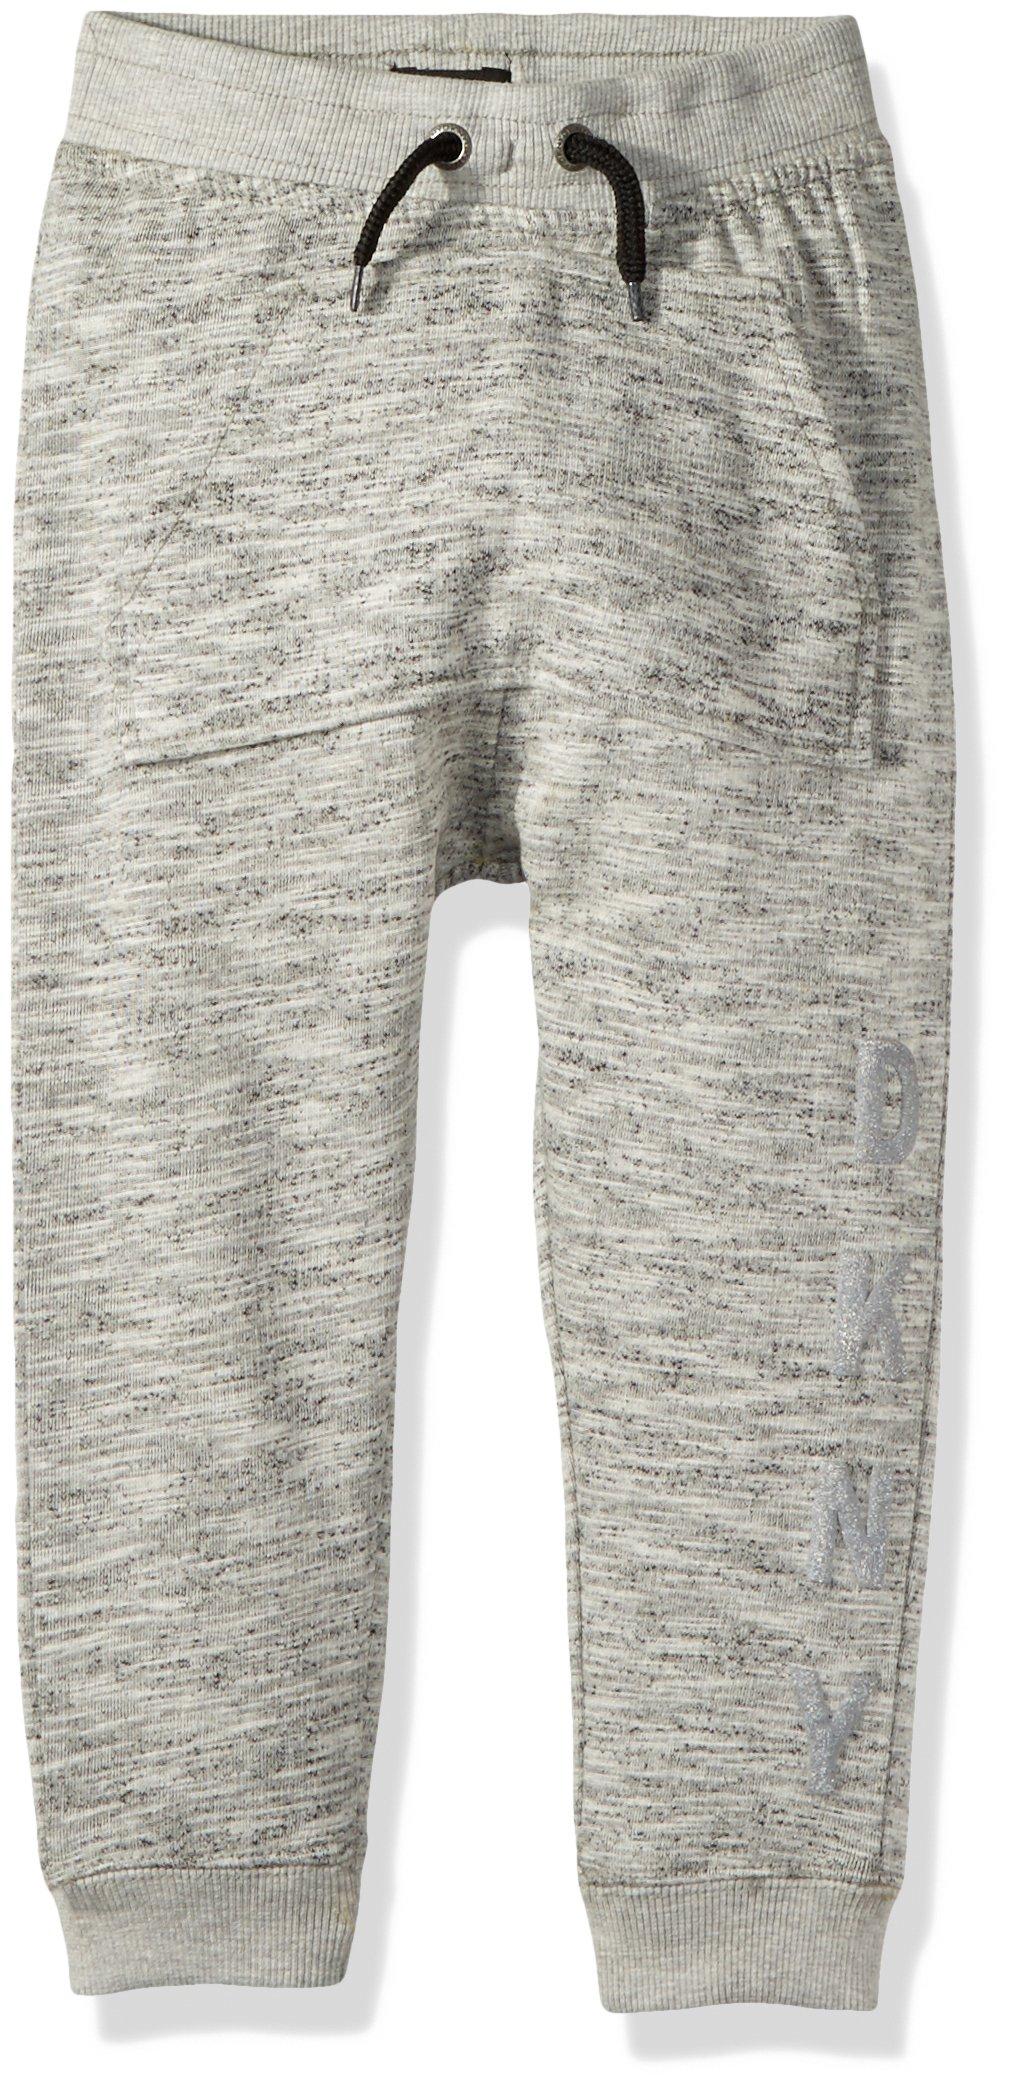 DKNY Big Boys' Marled Fleece Pull on Jog Pant, Heather Light, 10/12